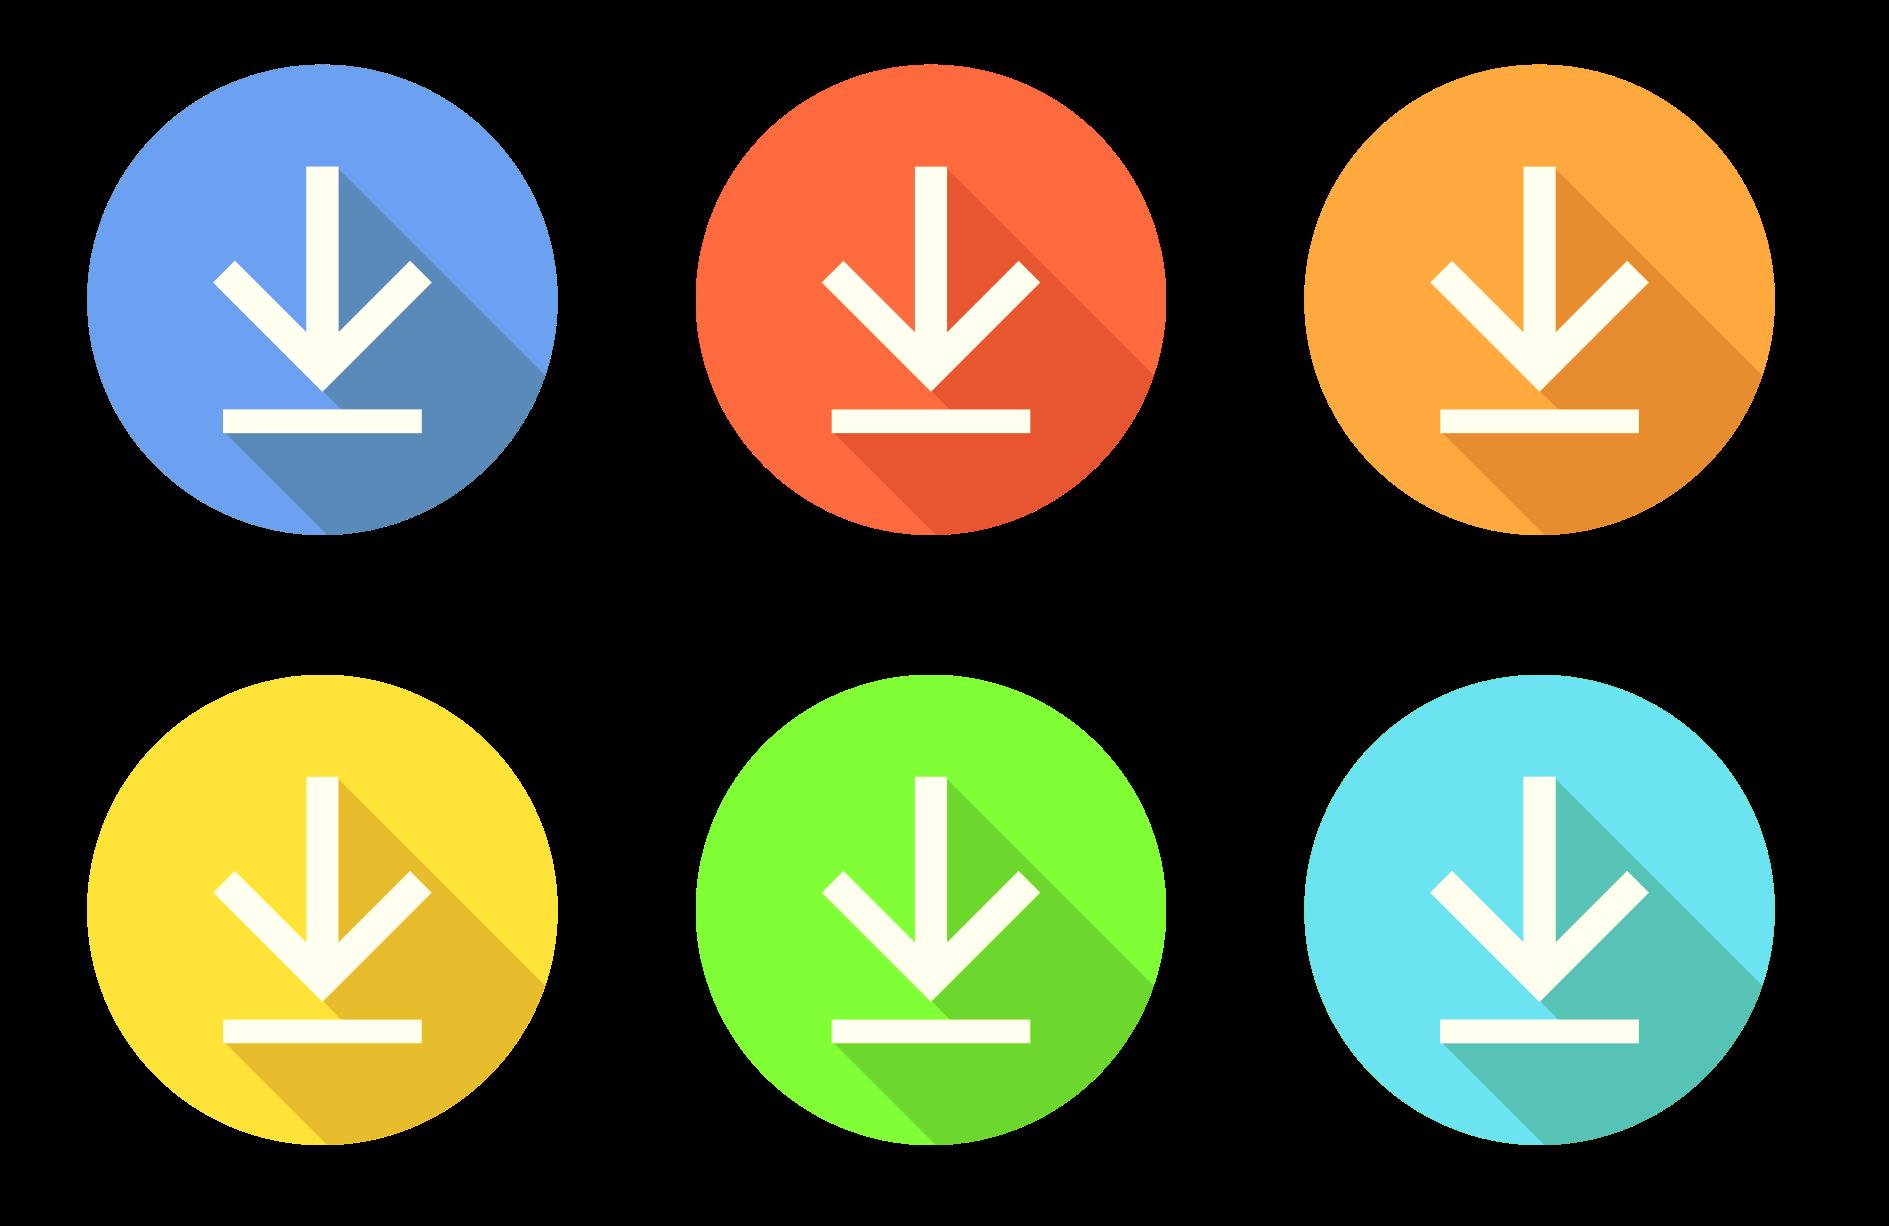 Imagen de iconos de descarga en seis colores